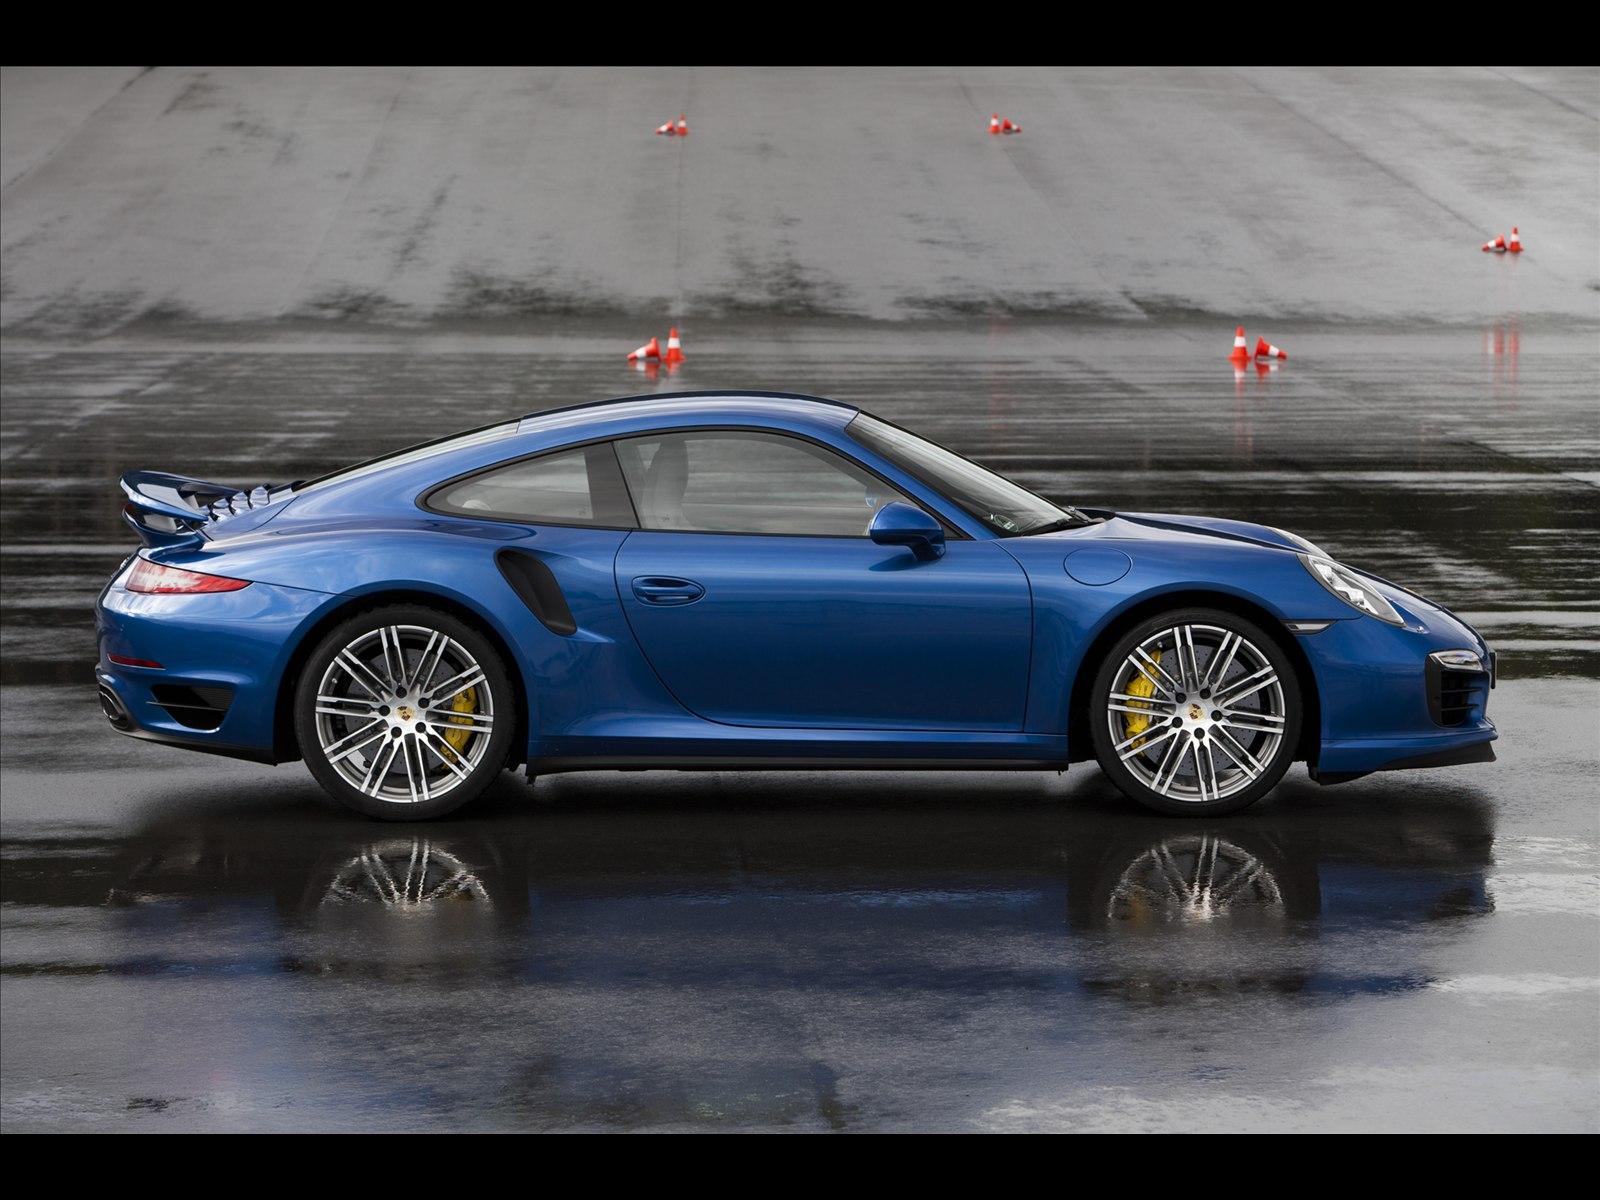 Home Porsche Porsche 911 Turbo S 2014 1600x1200